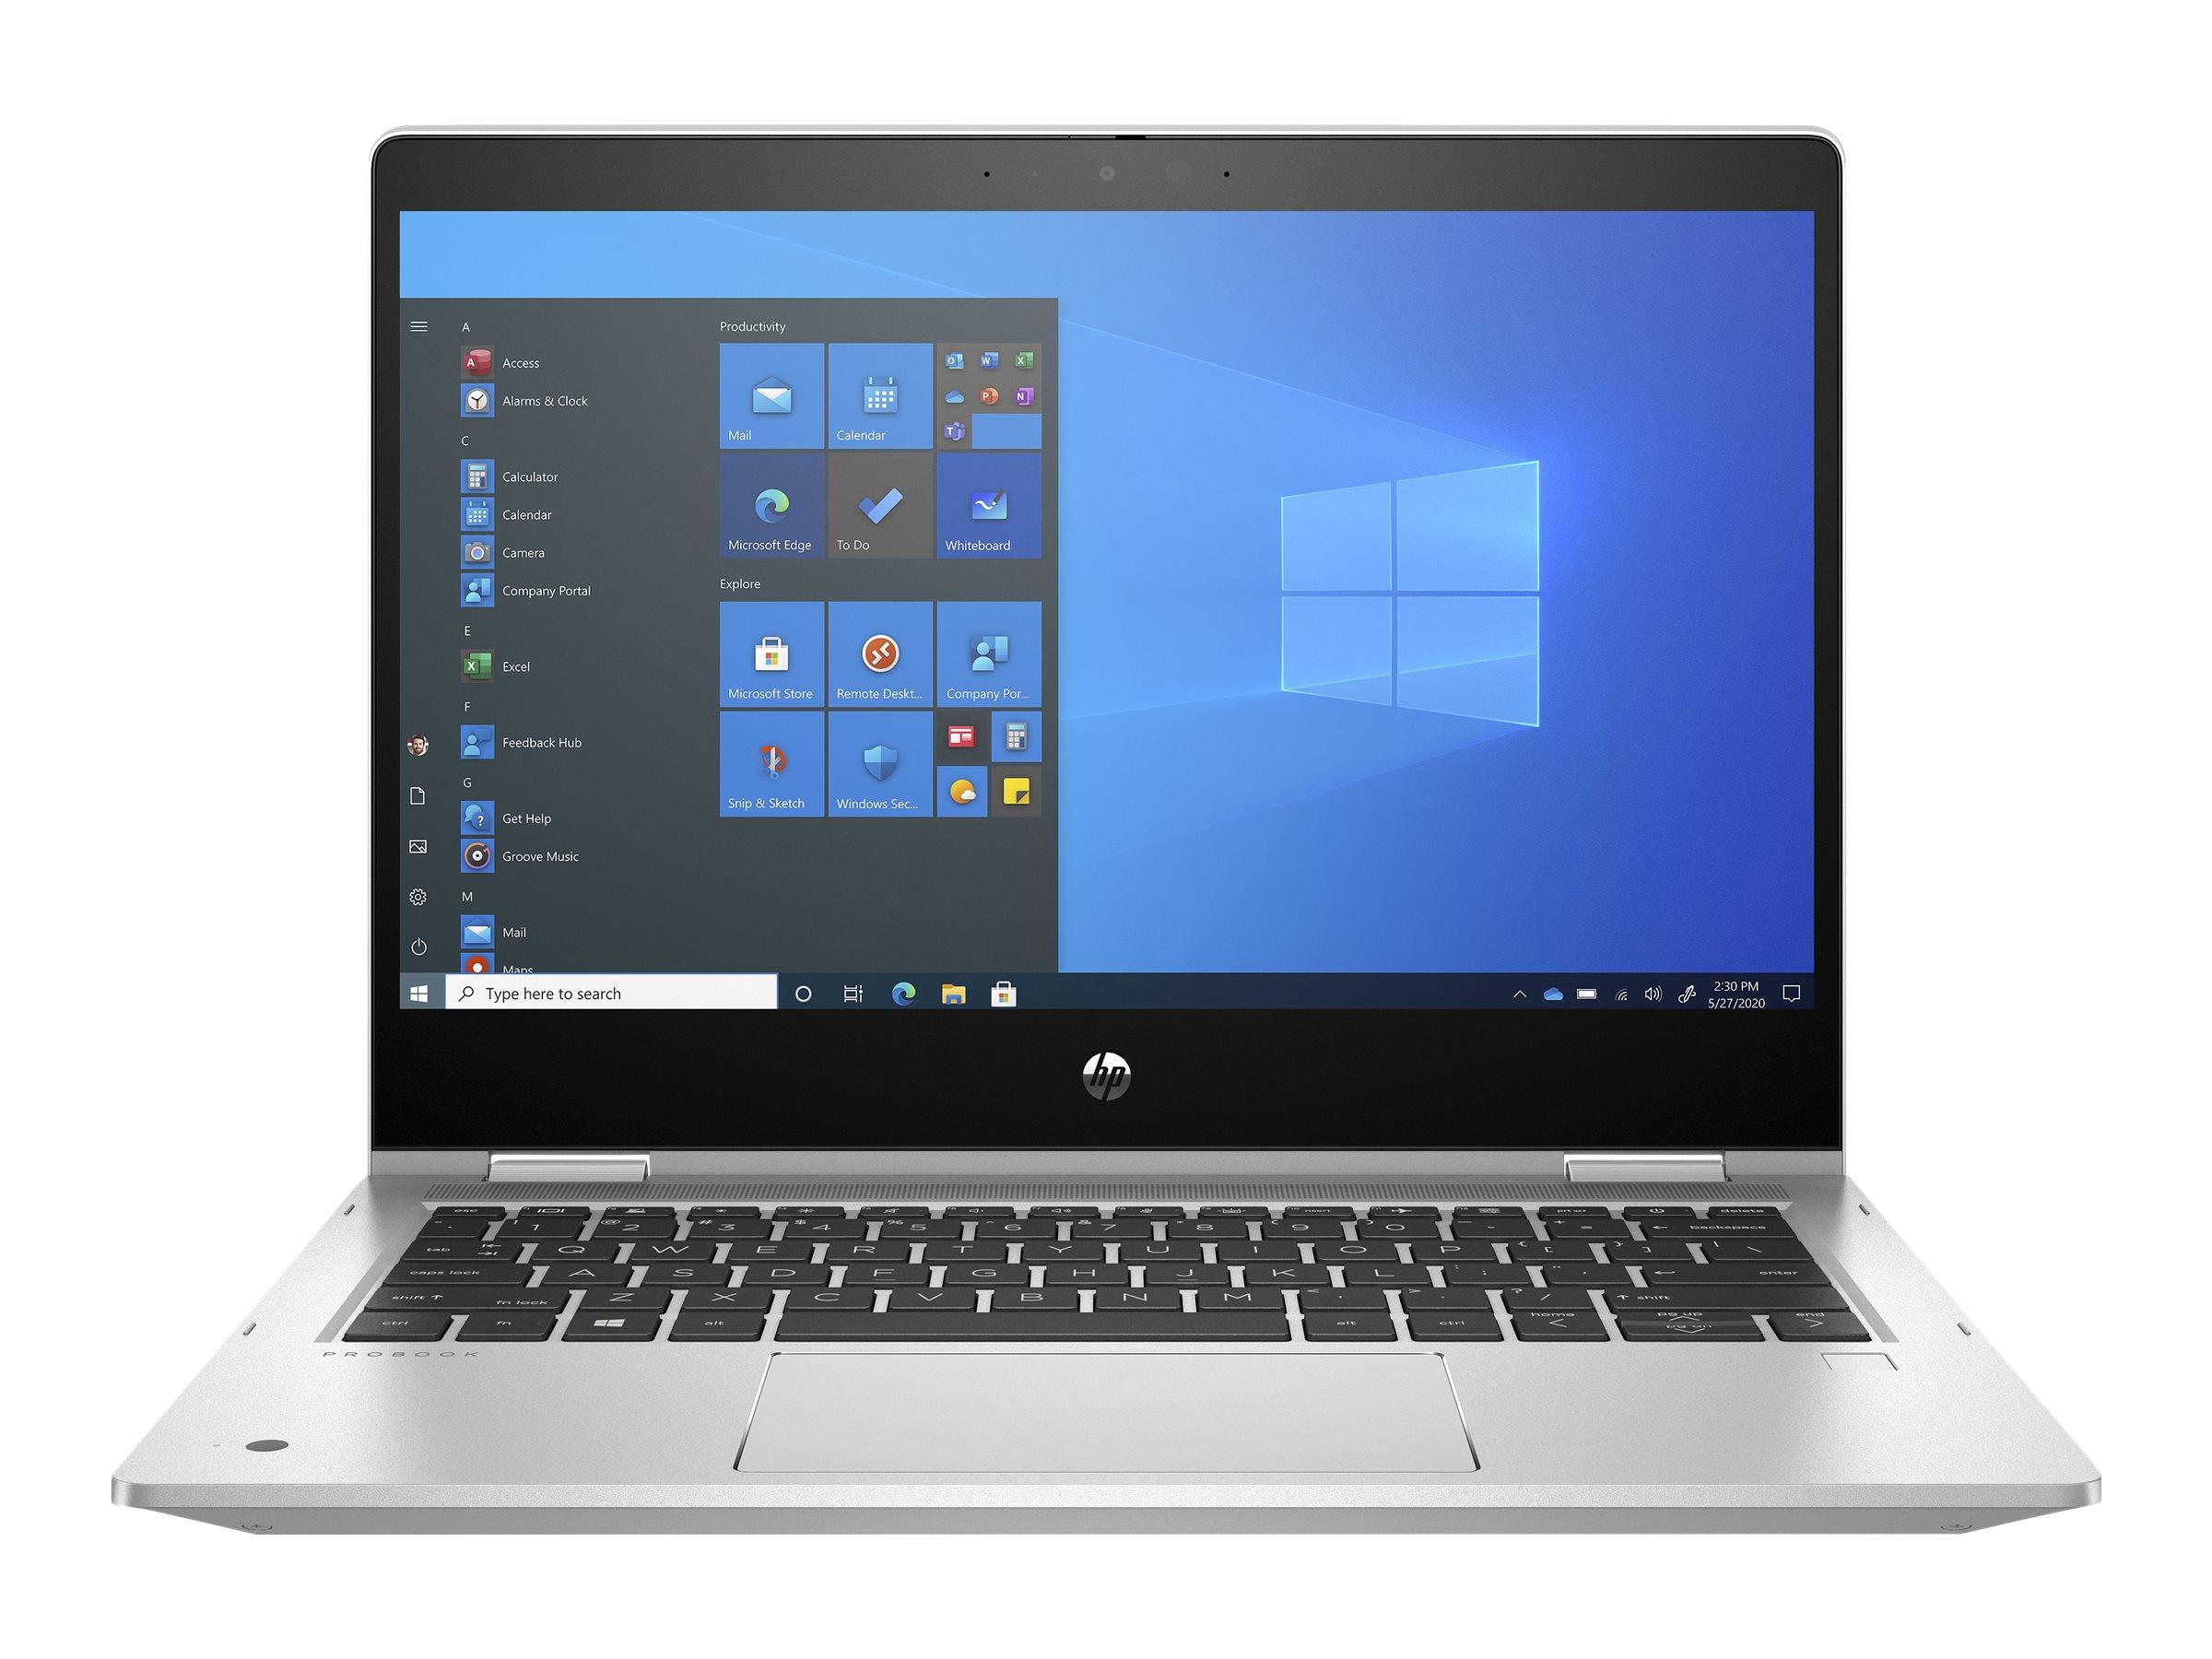 HP ProBook x360 435 G8 - Flip-Design - Ryzen 3 5400U / 2.6 GHz - Win 10 Pro 64-Bit - 8 GB RAM - 256 GB SSD NVMe, TLC, HP